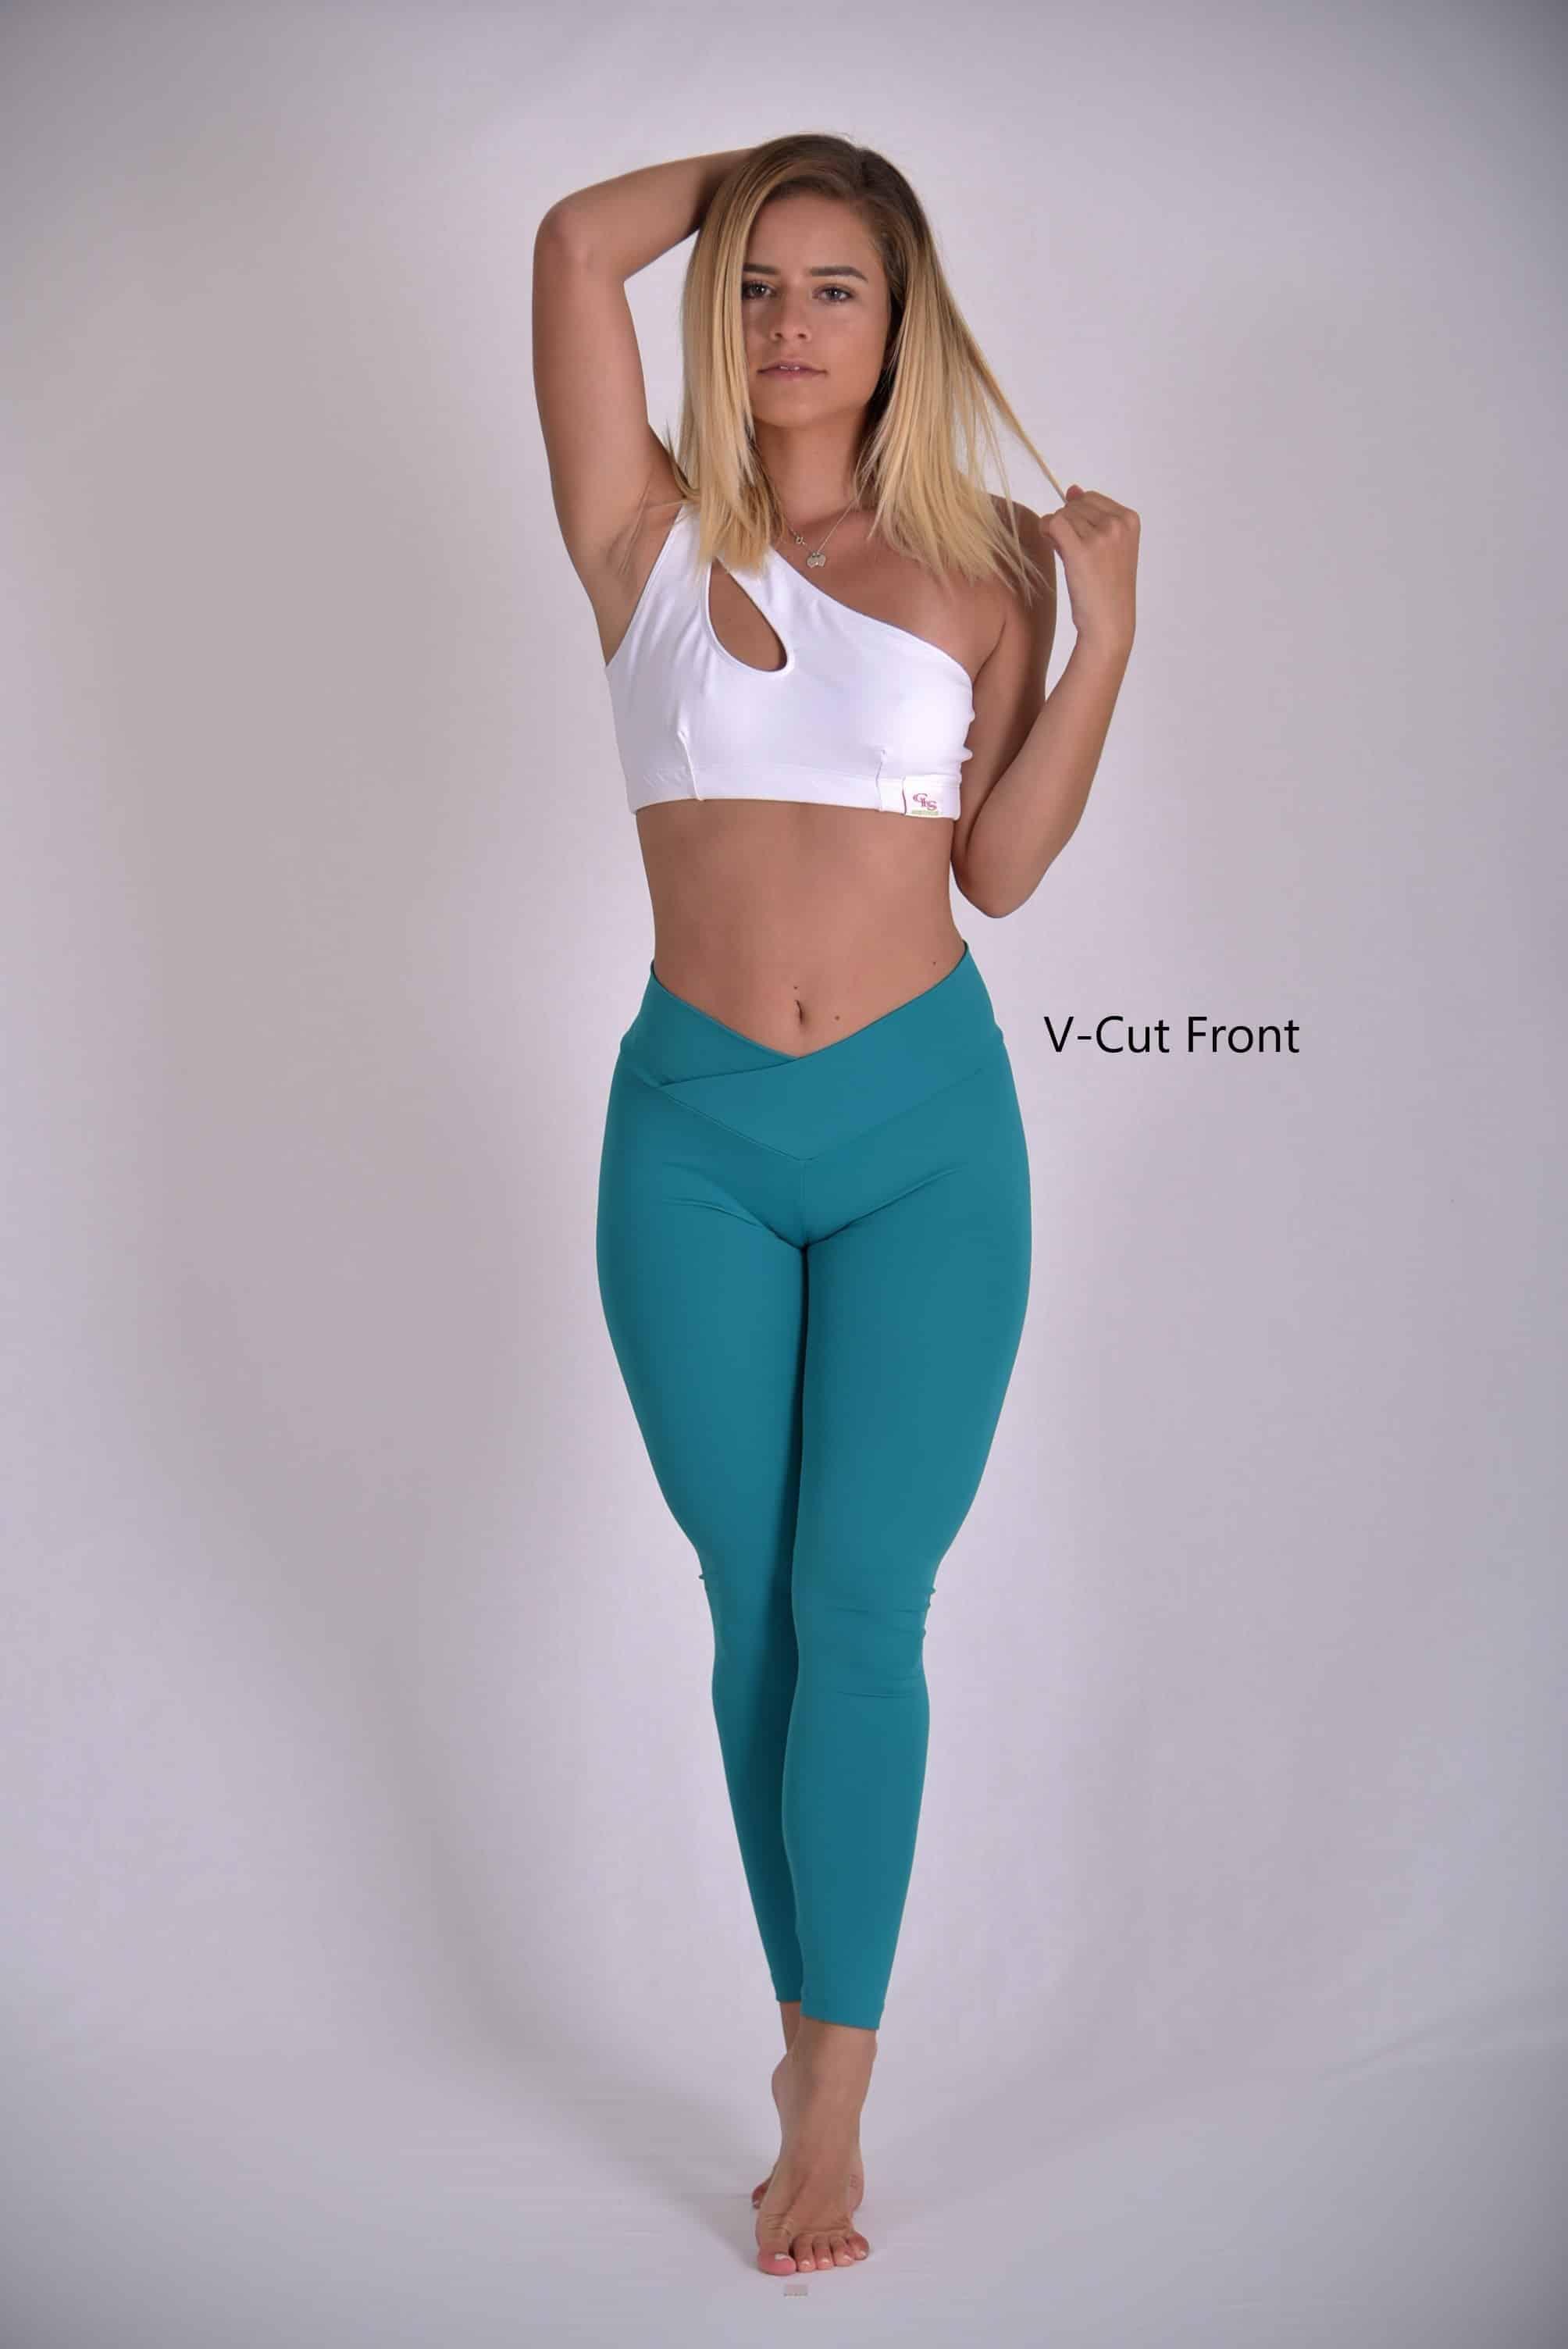 fb241c333d2a0 CLS Sportswear - Leggings, Scrunch Butt, Yoga Pants, Tights